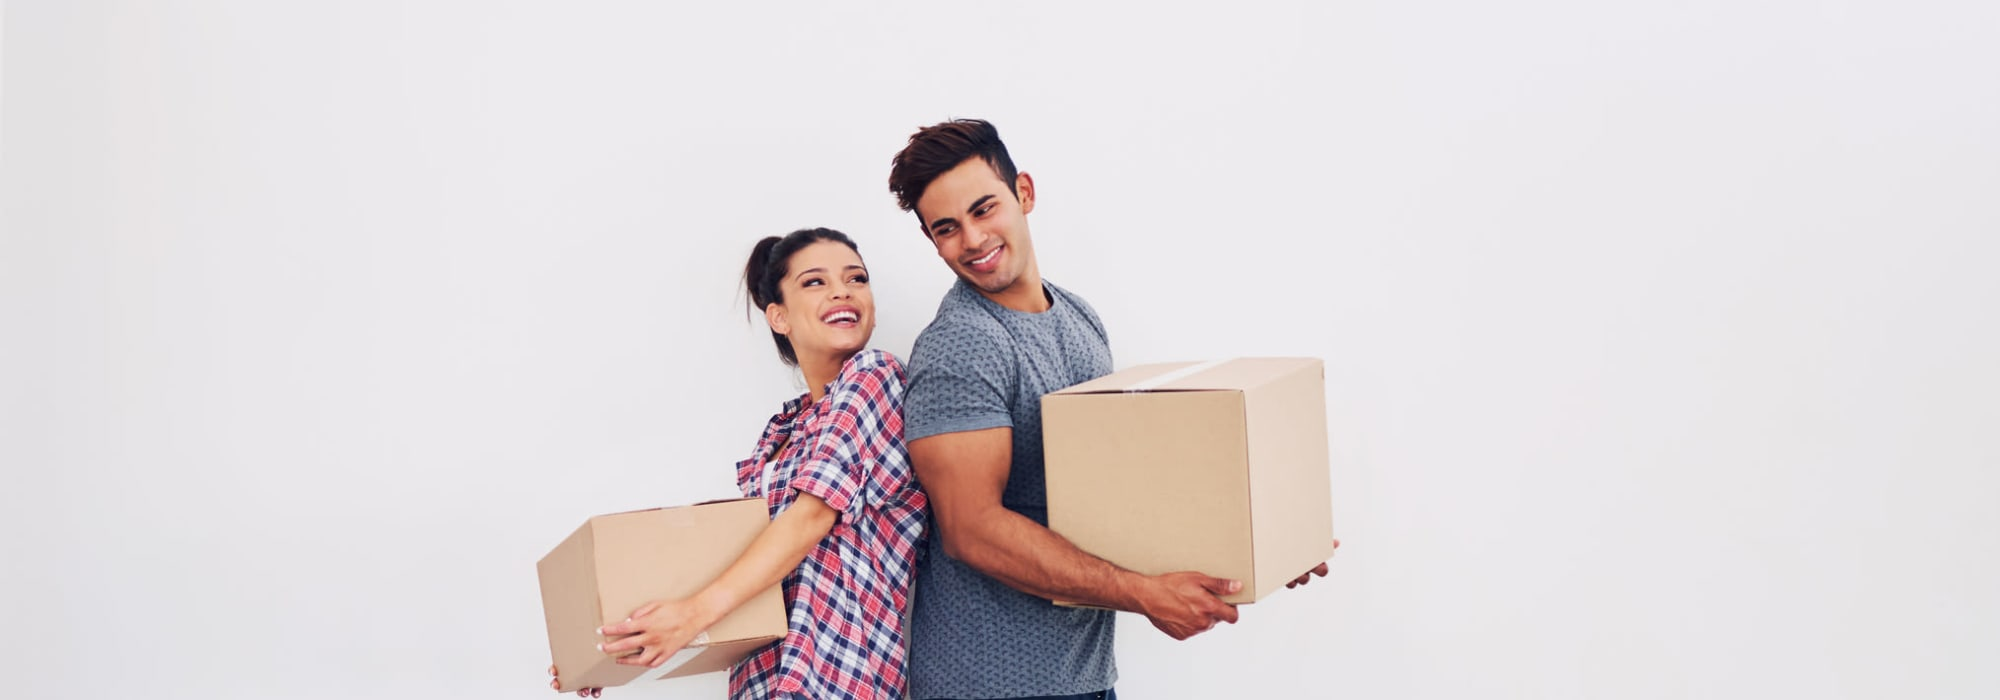 Couple holding packing boxes Self Storage Plus in Manassas, Virginia.